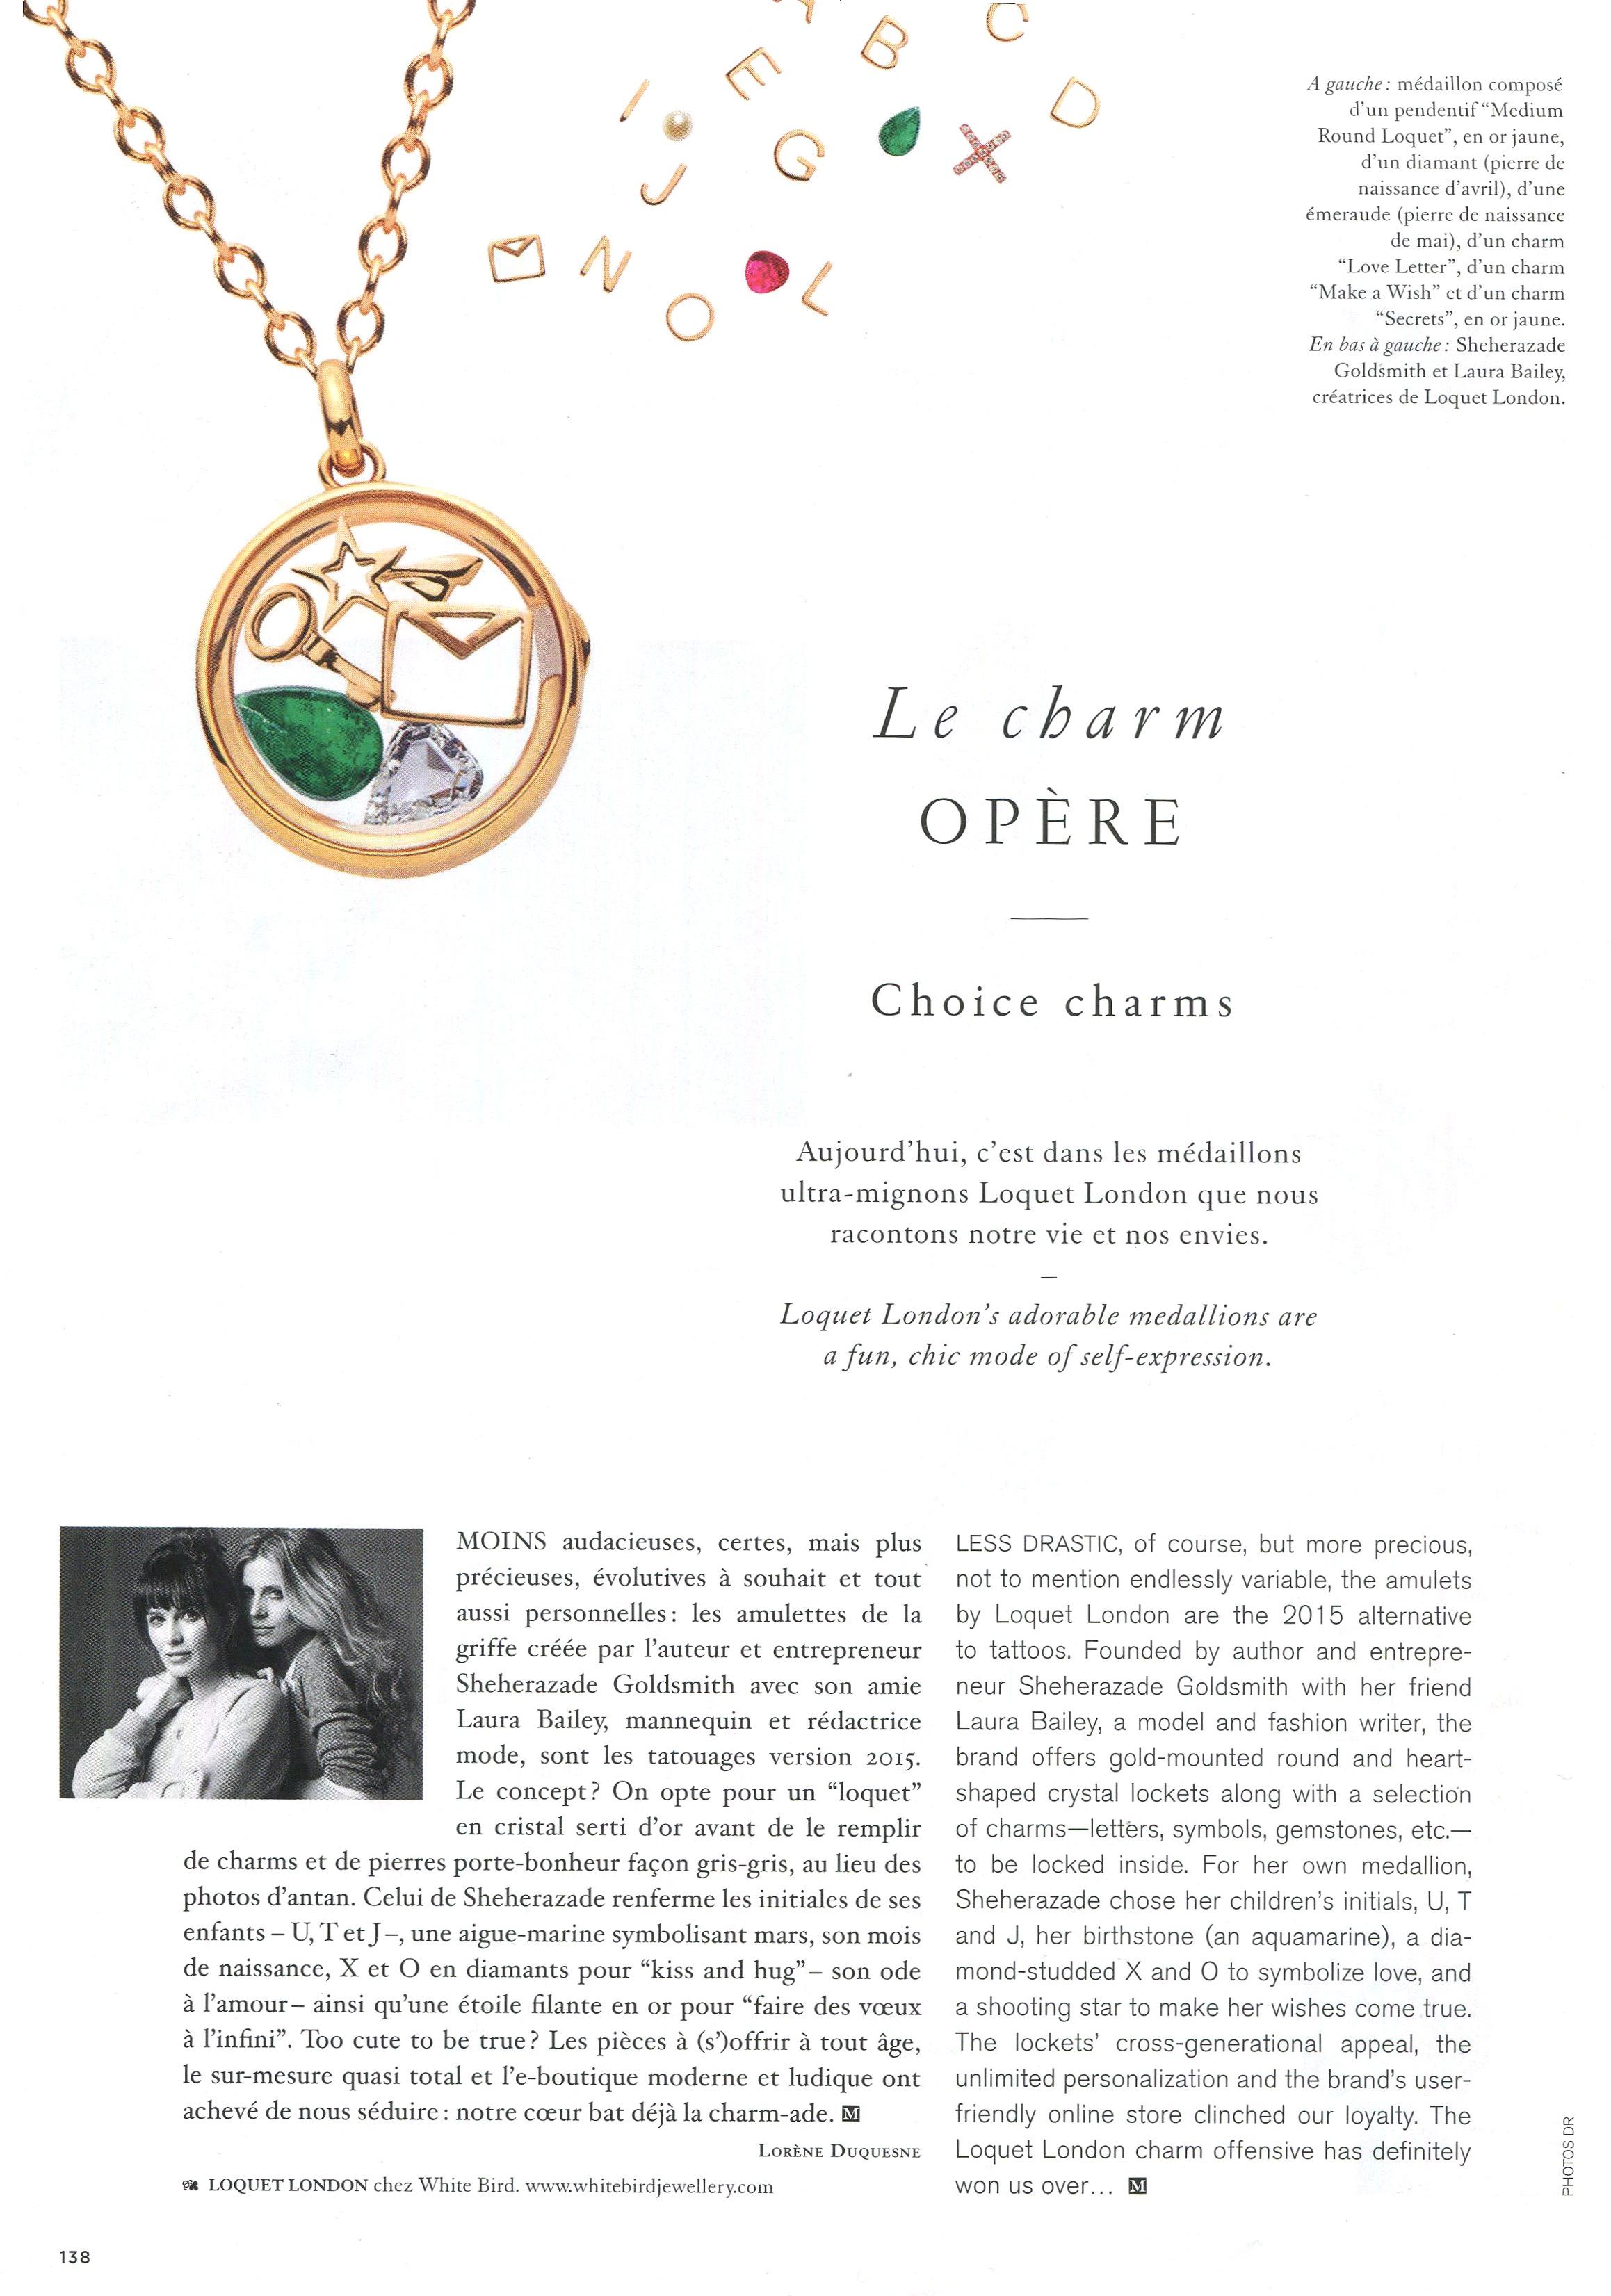 coverage-air-france-madame-may-2015-page-2